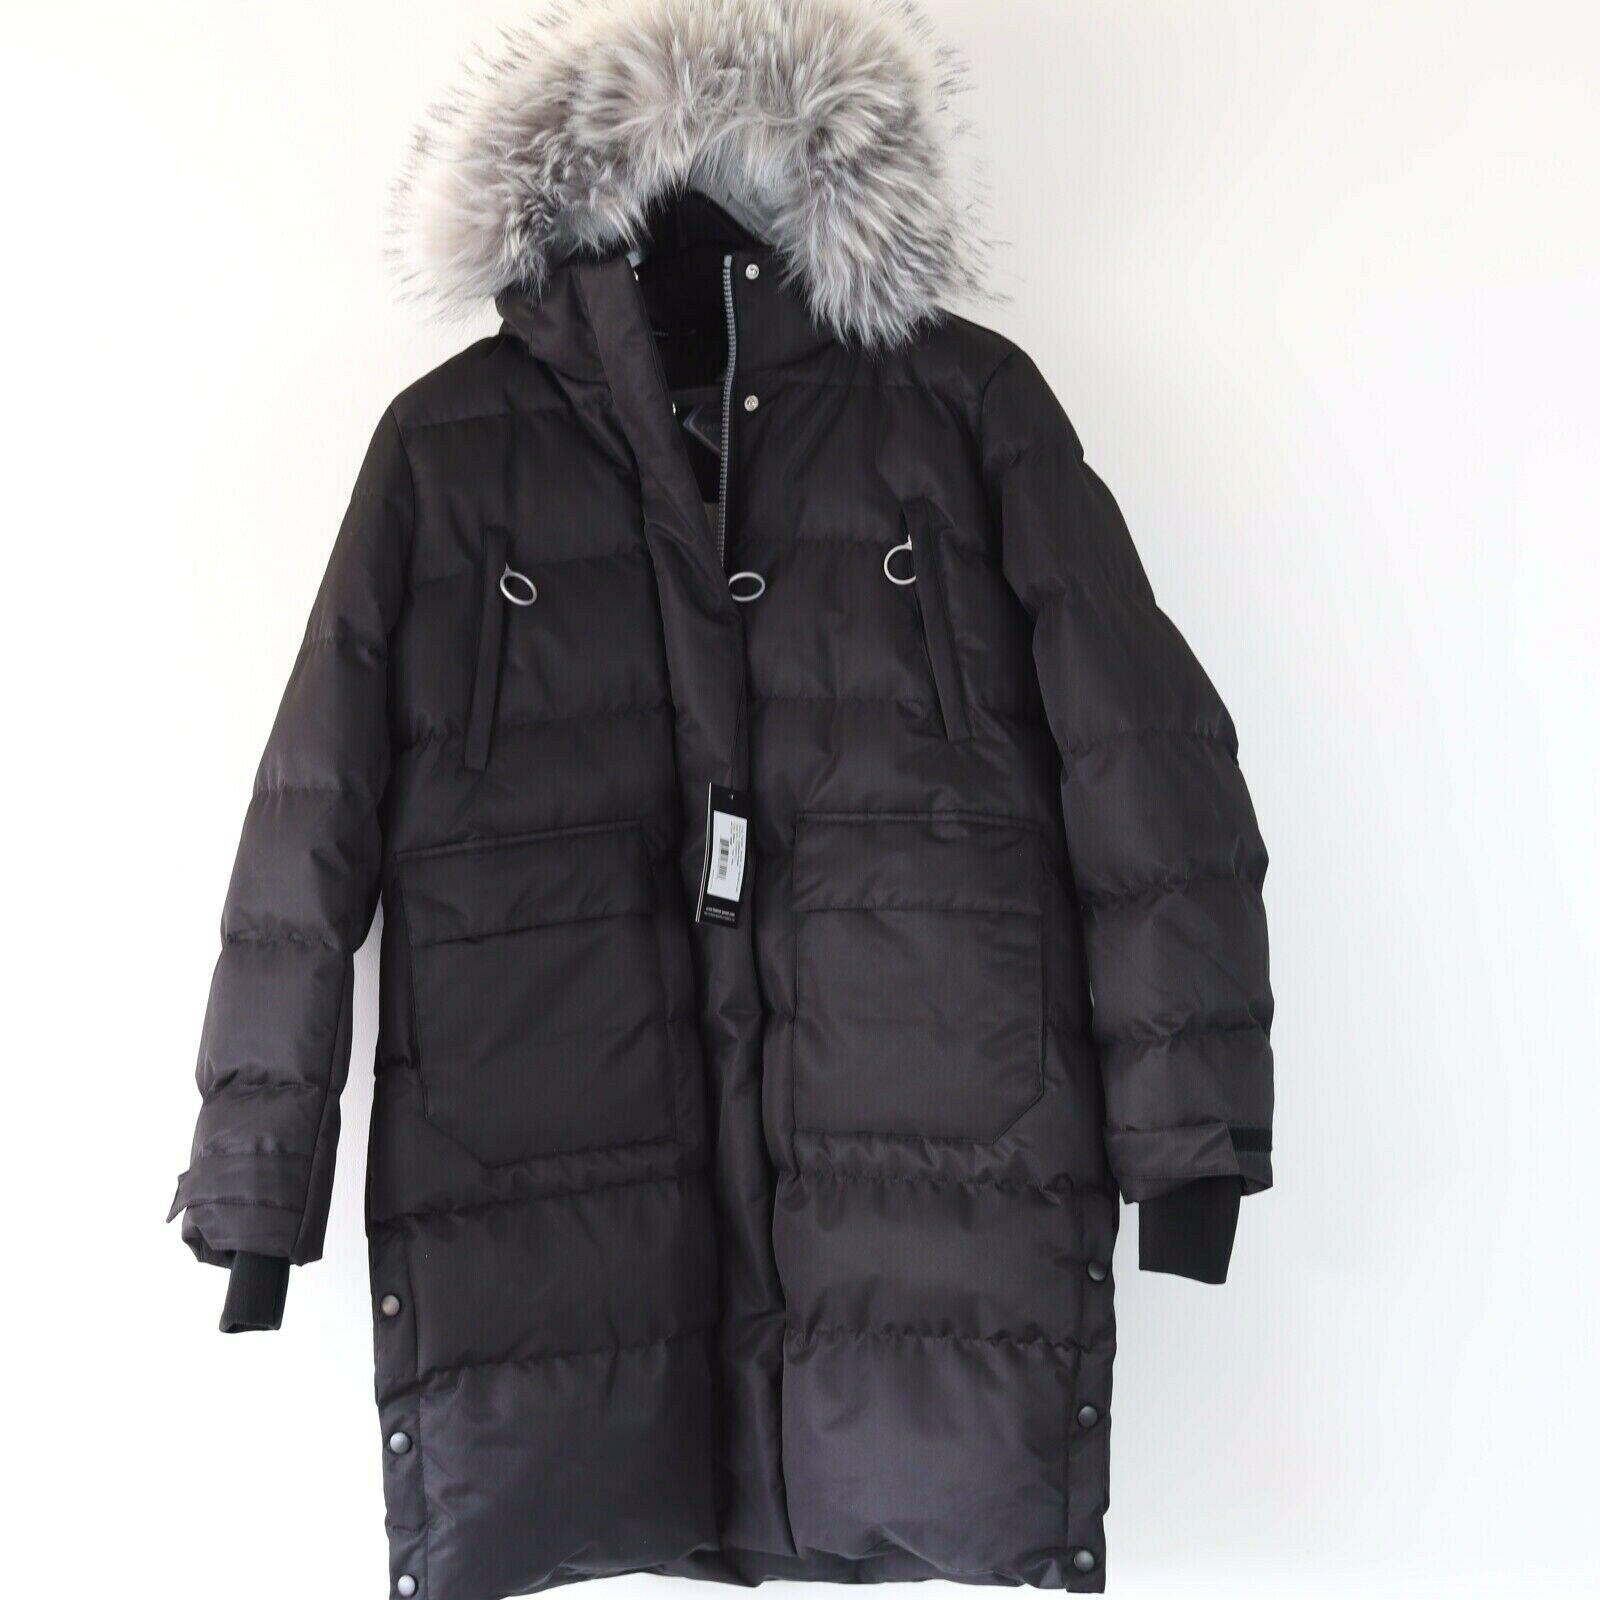 NWT Fashion Power - Black Active Coat w/Hood Women's Size XXL